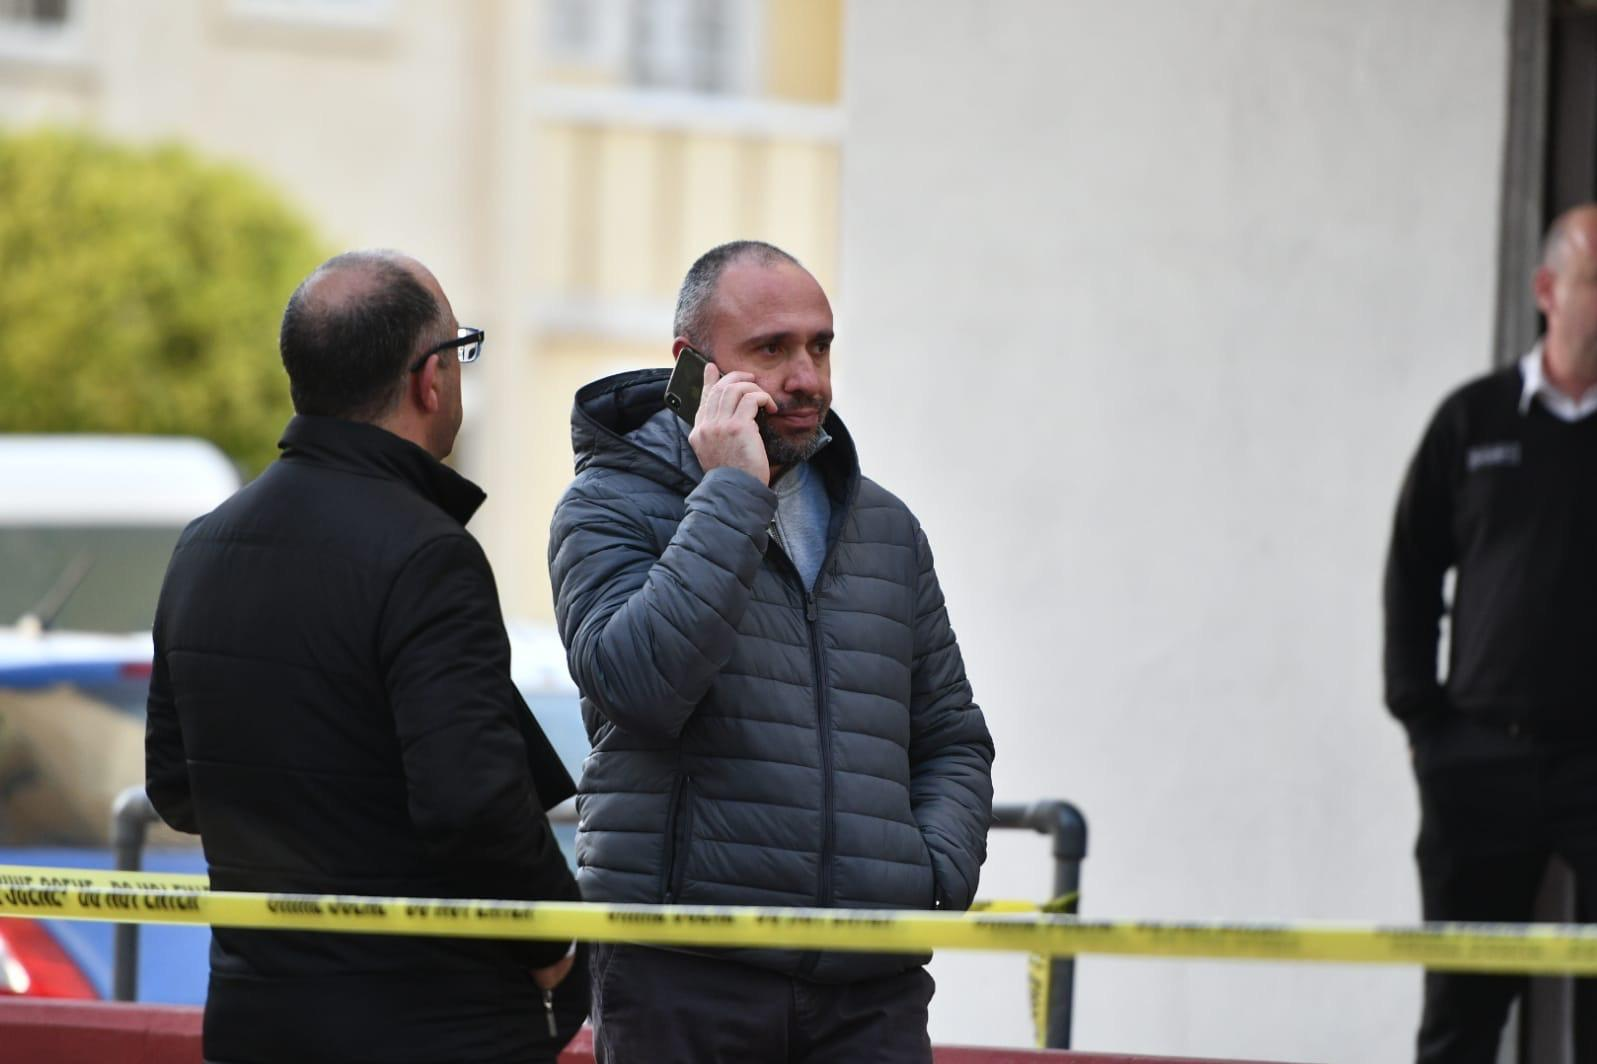 Keith Arnaud, the lead investigator in the Daphne Caruana Galizia murder case.